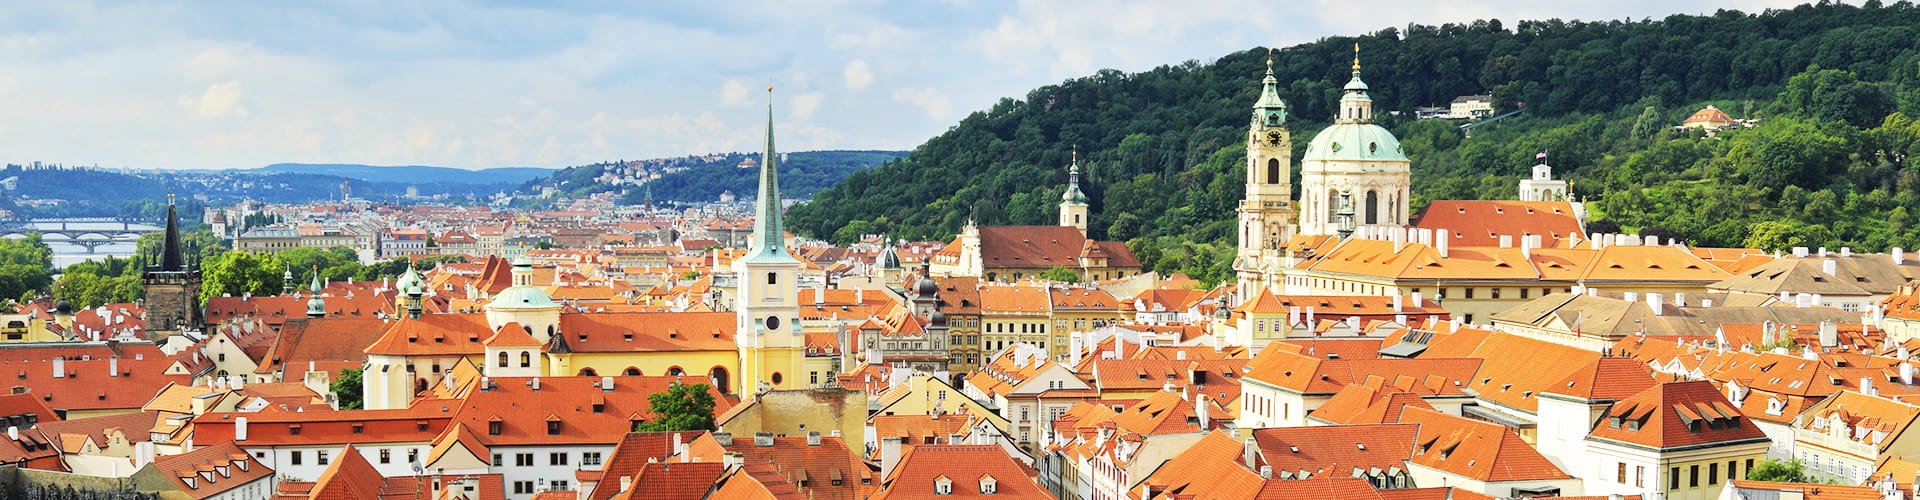 Прага Чехия eurostudy